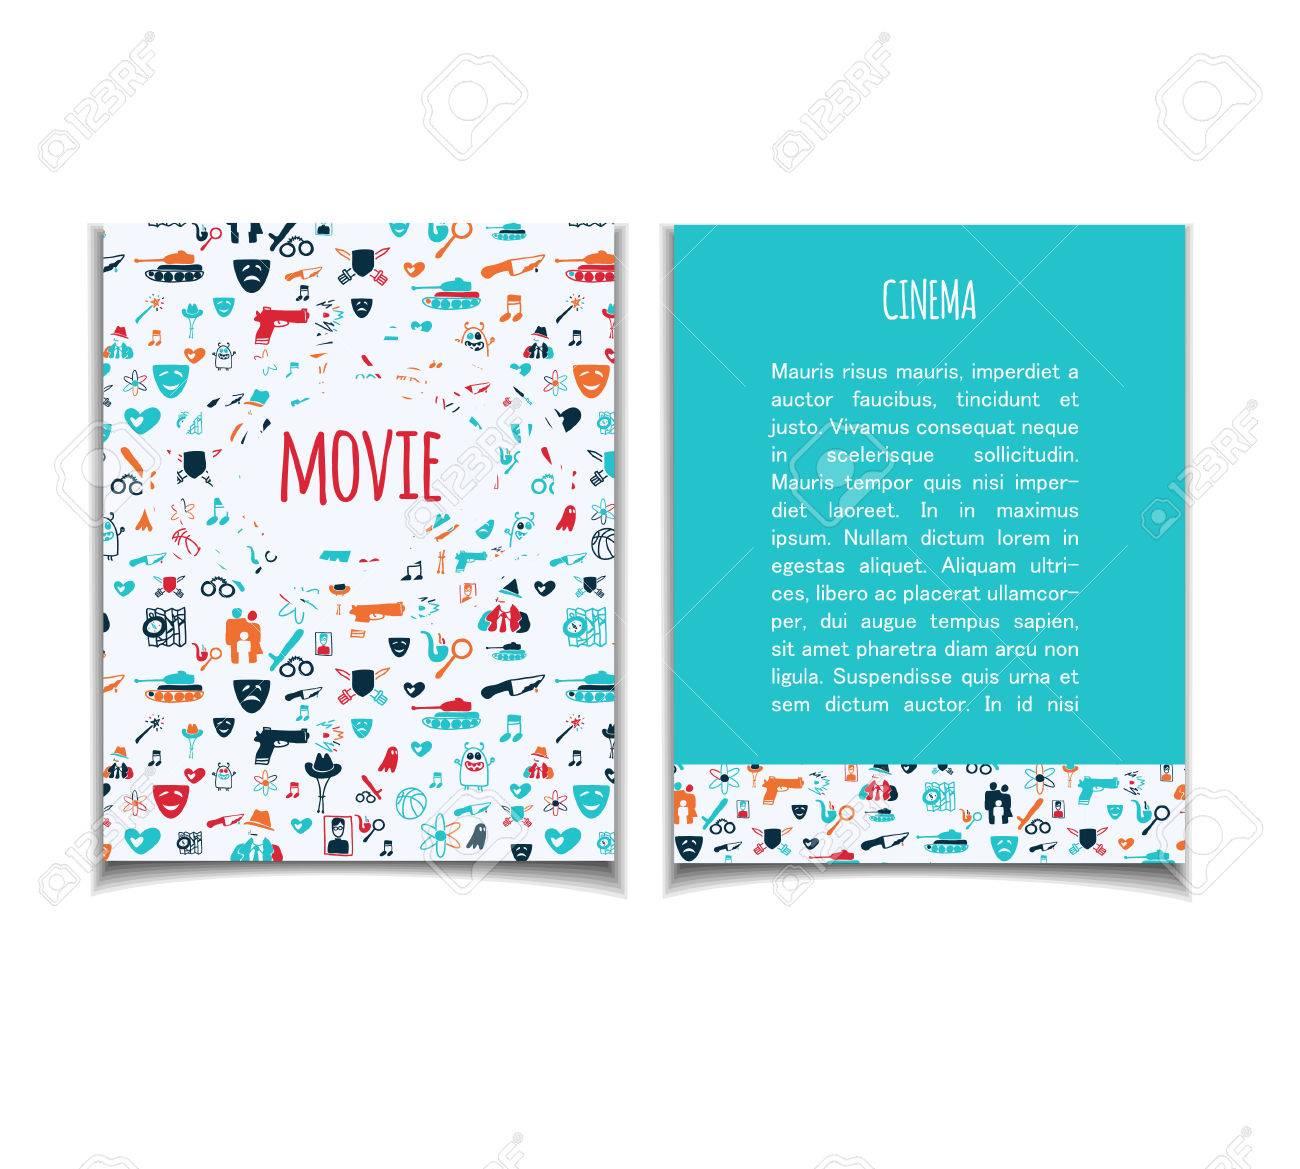 Kino Vektor Vorlage Festgelegt Film Genre Thema Action Romantik